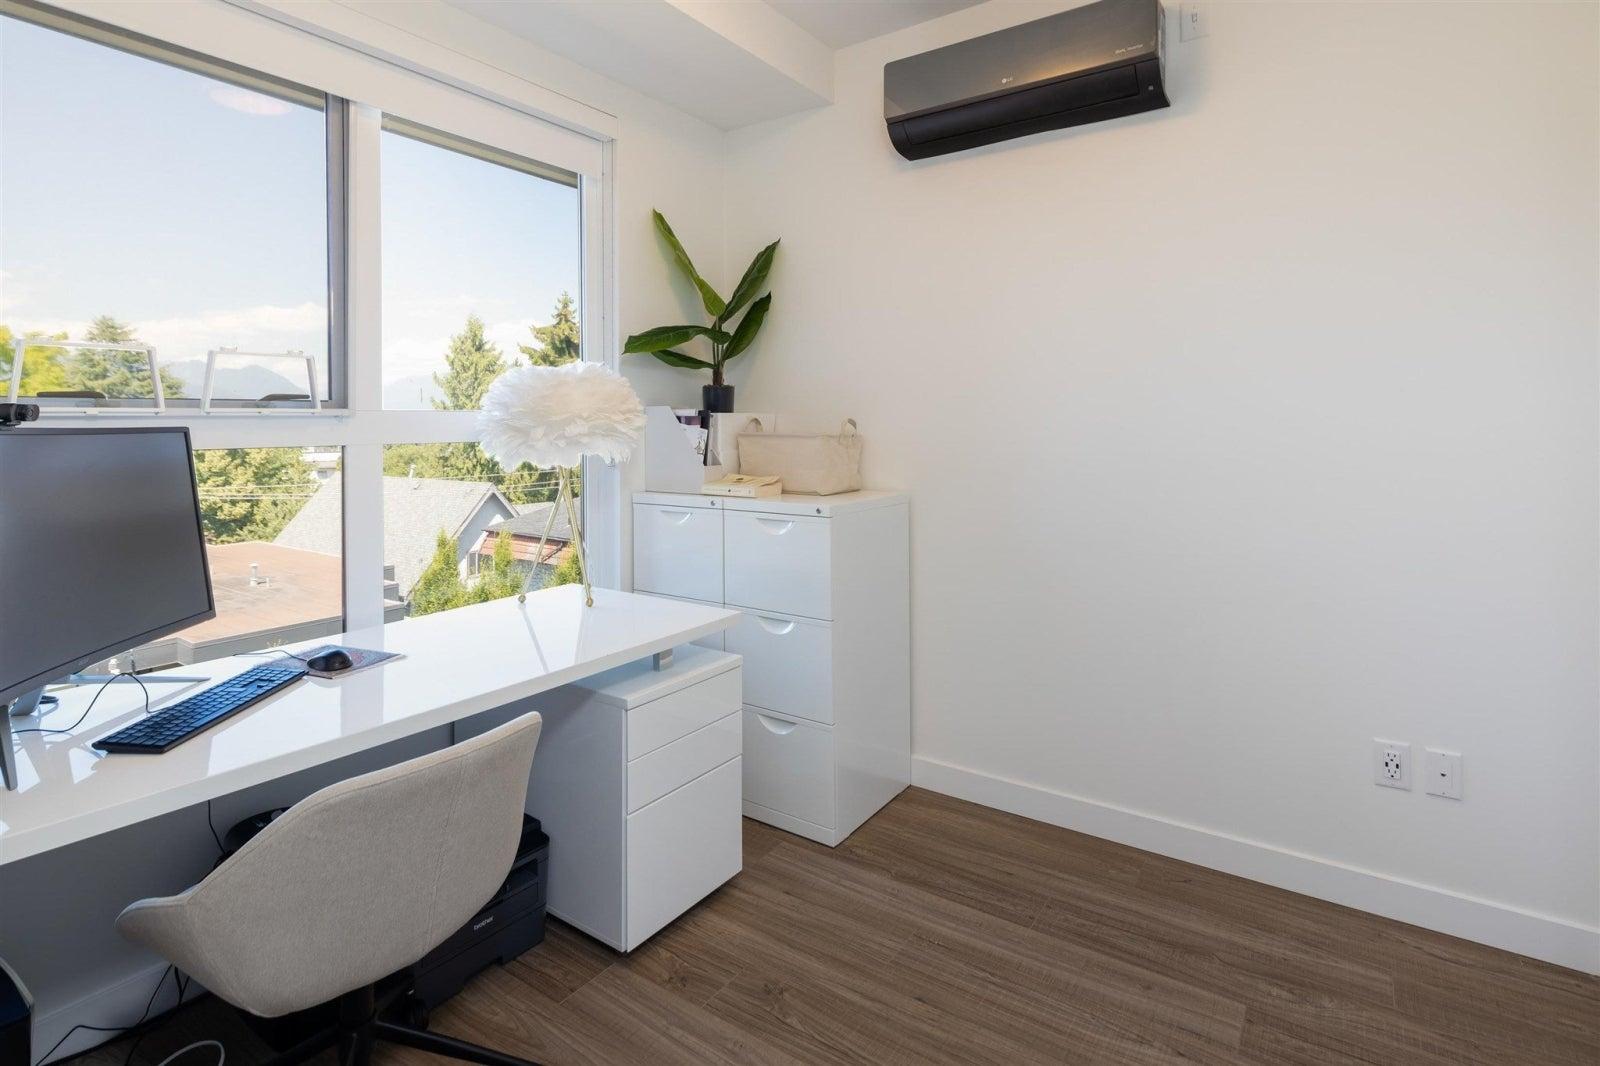 408 379 E BROADWAY AVENUE - Mount Pleasant VE Apartment/Condo for sale, 2 Bedrooms (R2599900) #17